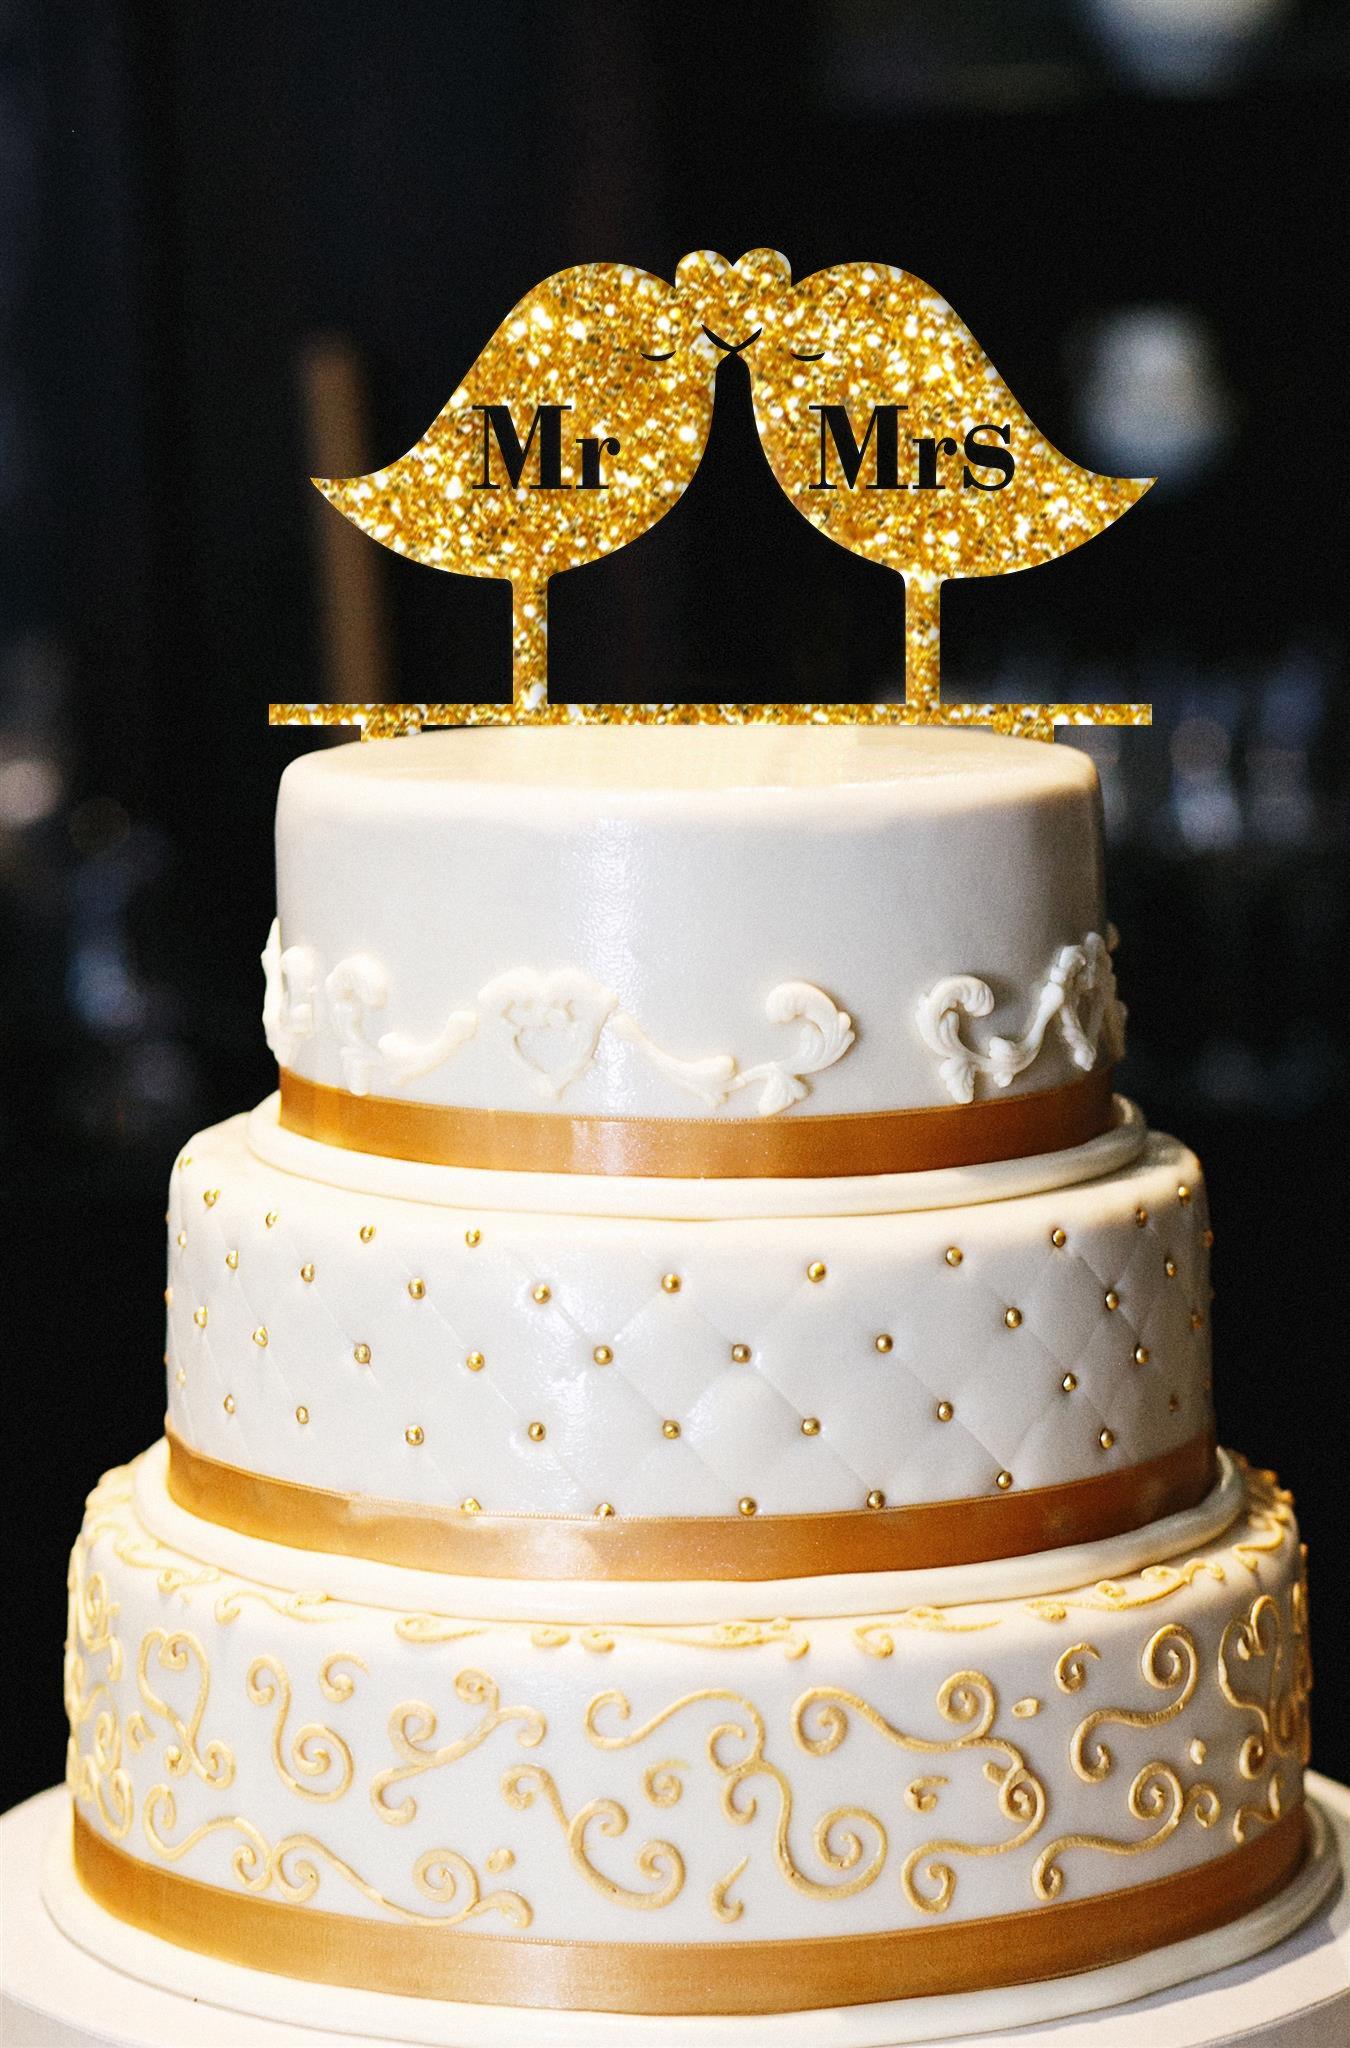 Mr & Mrs Wedding Cake Topper, Birds Wedding Cake Topper, Gold Wedding Cake Topper, Wedding Cake Topper, Gold Glitter Wedding Cake Topper (15'', Glitter Gold)